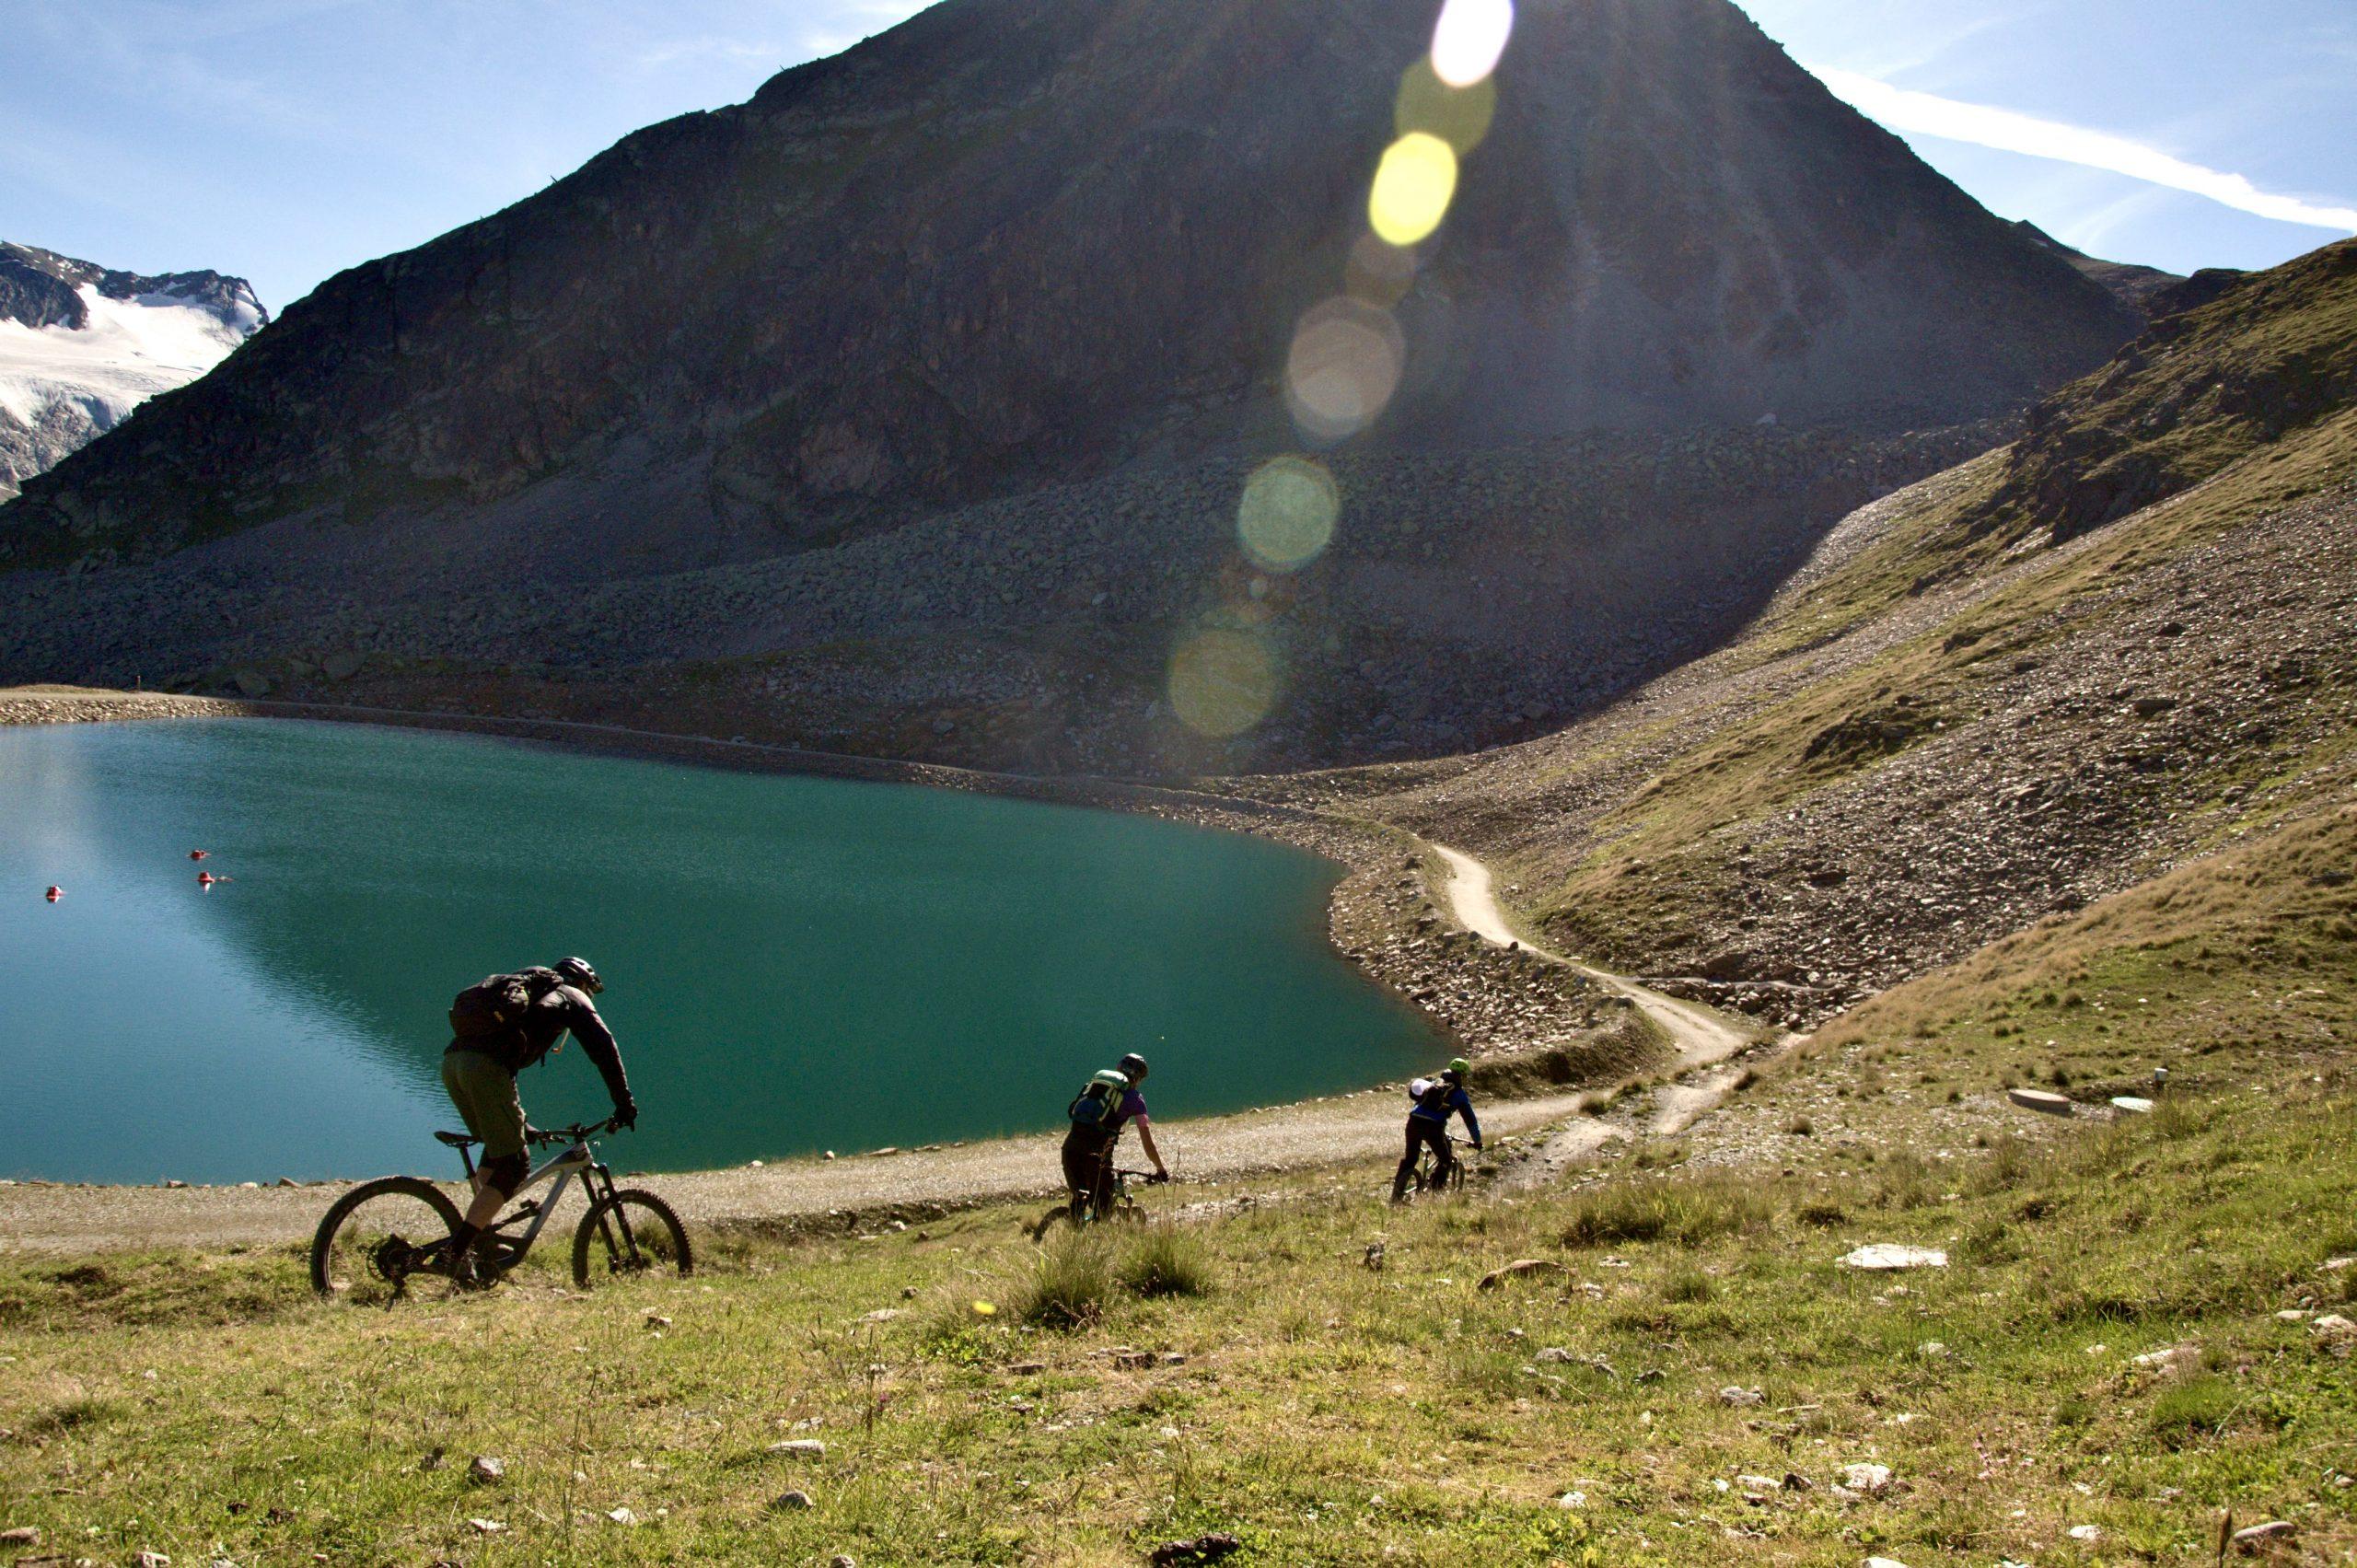 Ollweite line trail okolo vrchného jazera pri Hochkogl chate